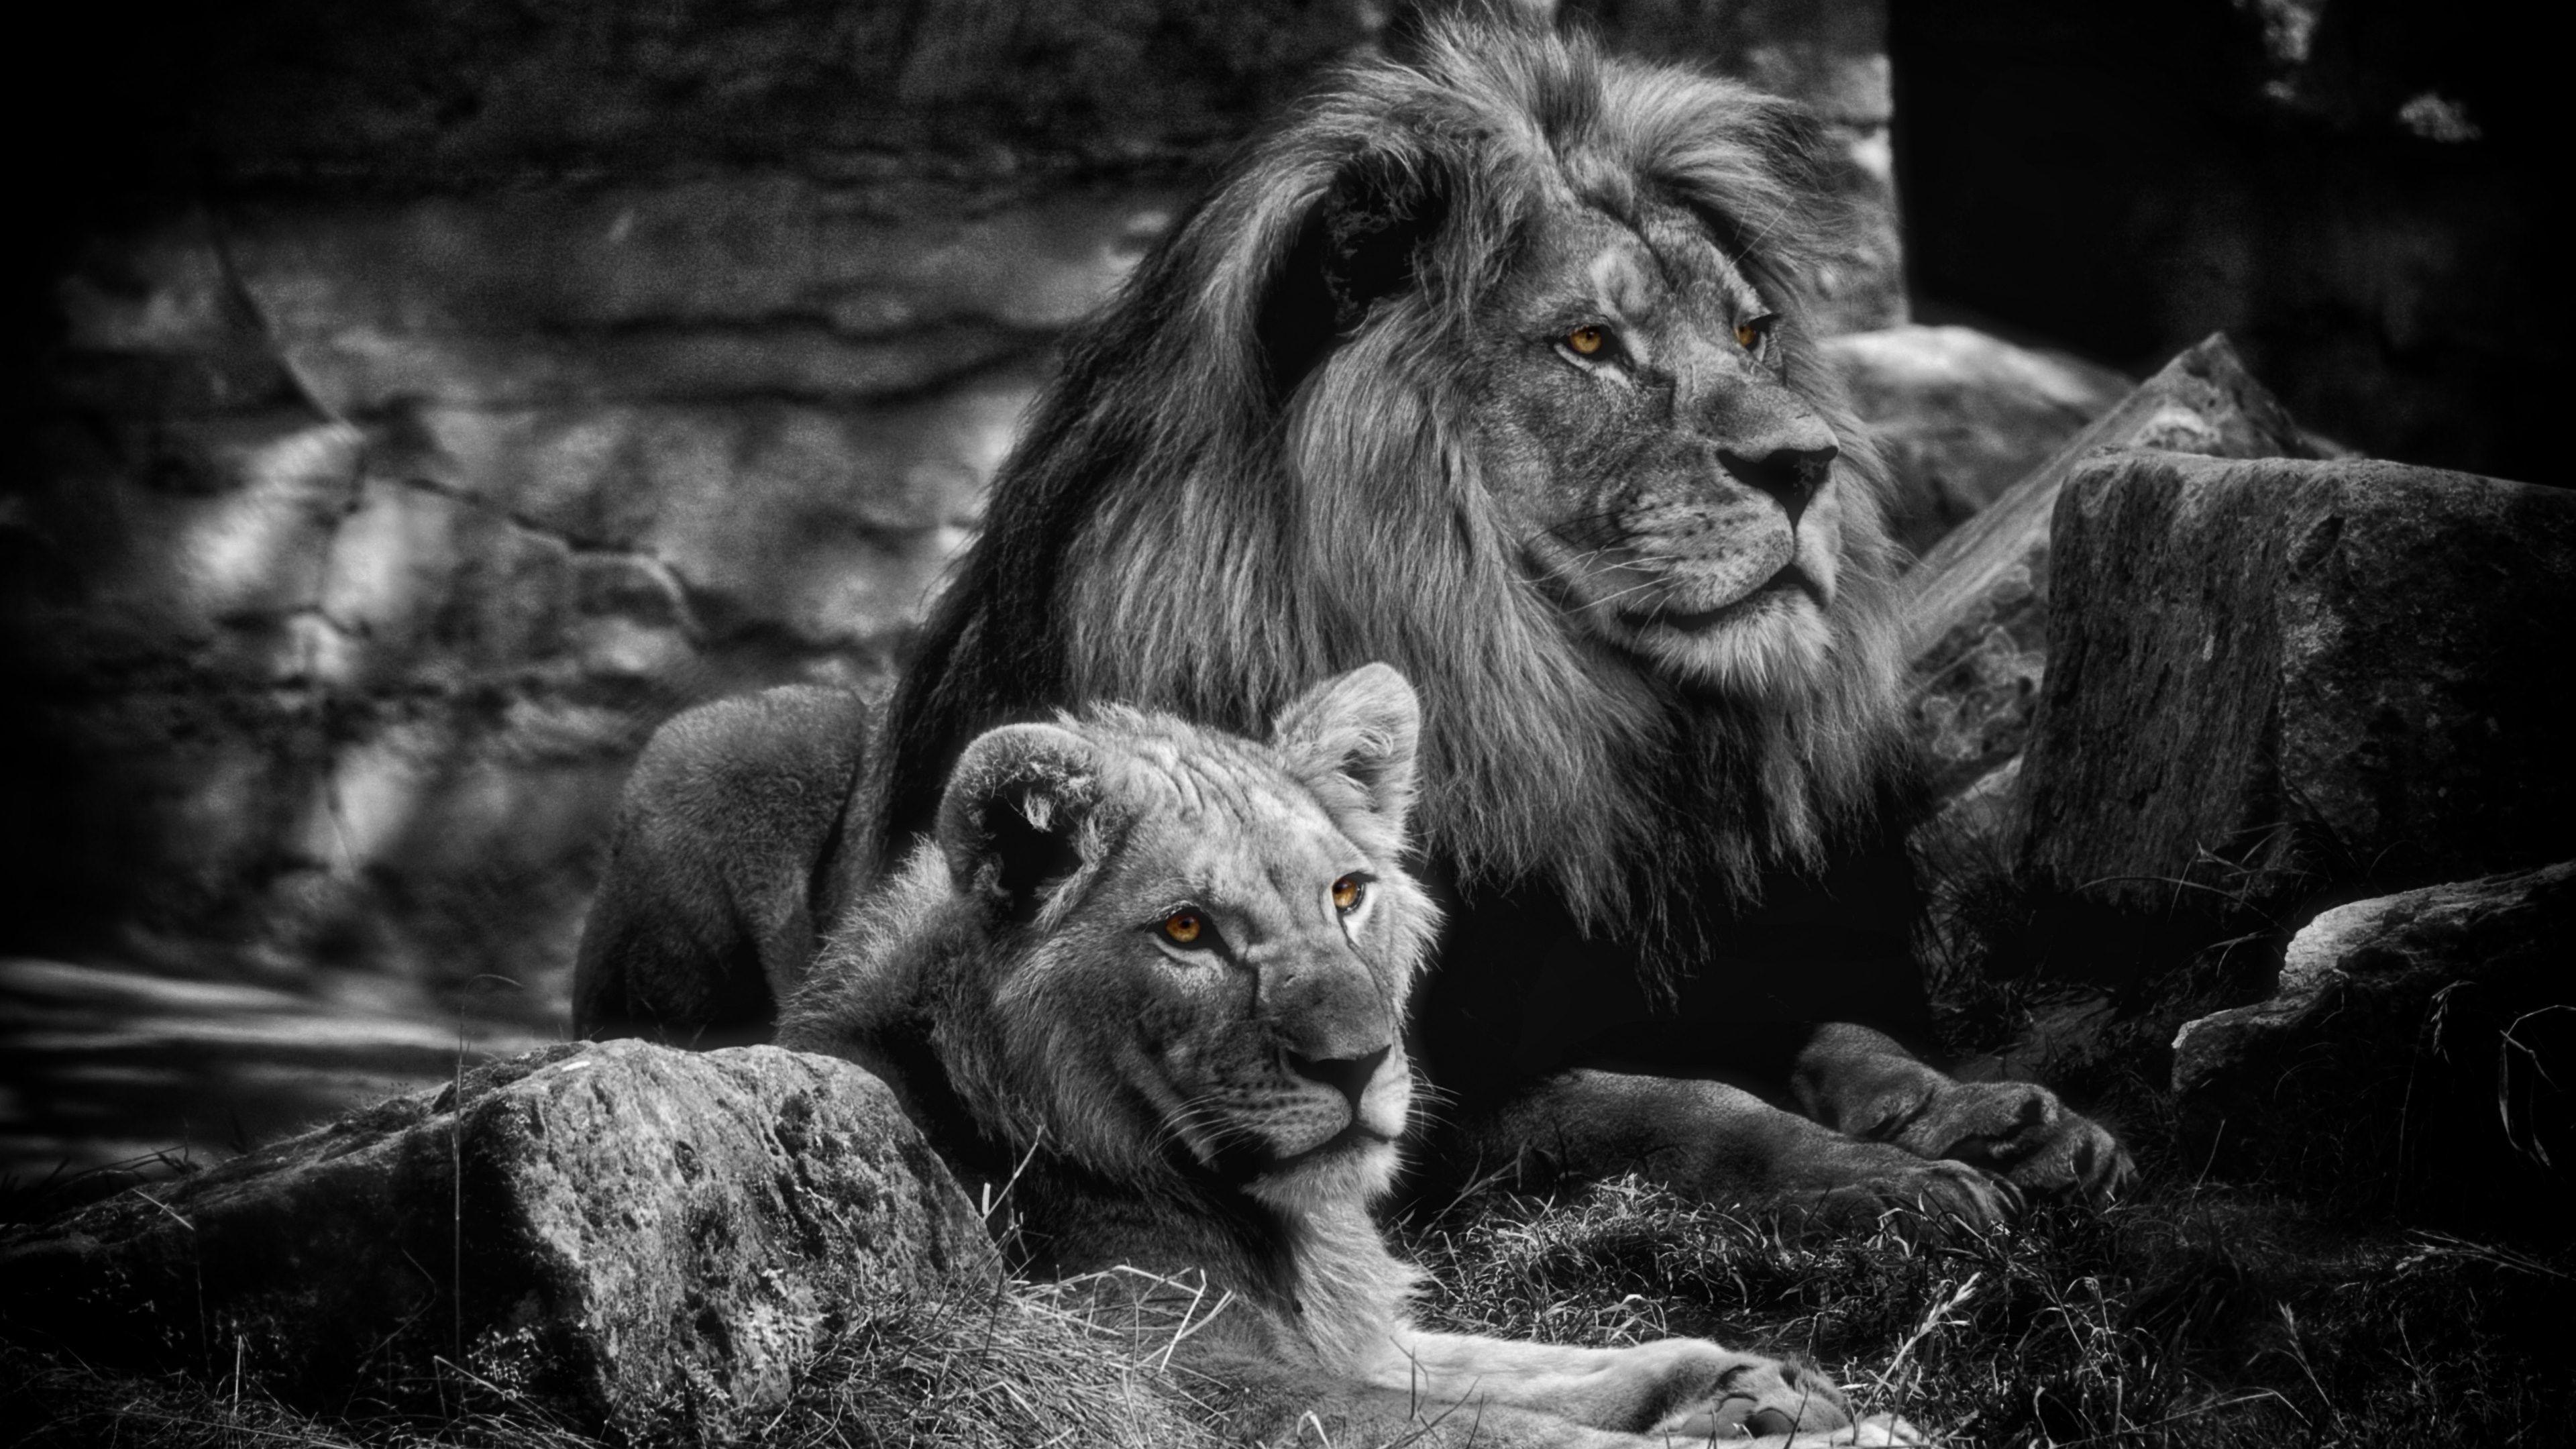 Desktop Background lion Black and white lion, Animals